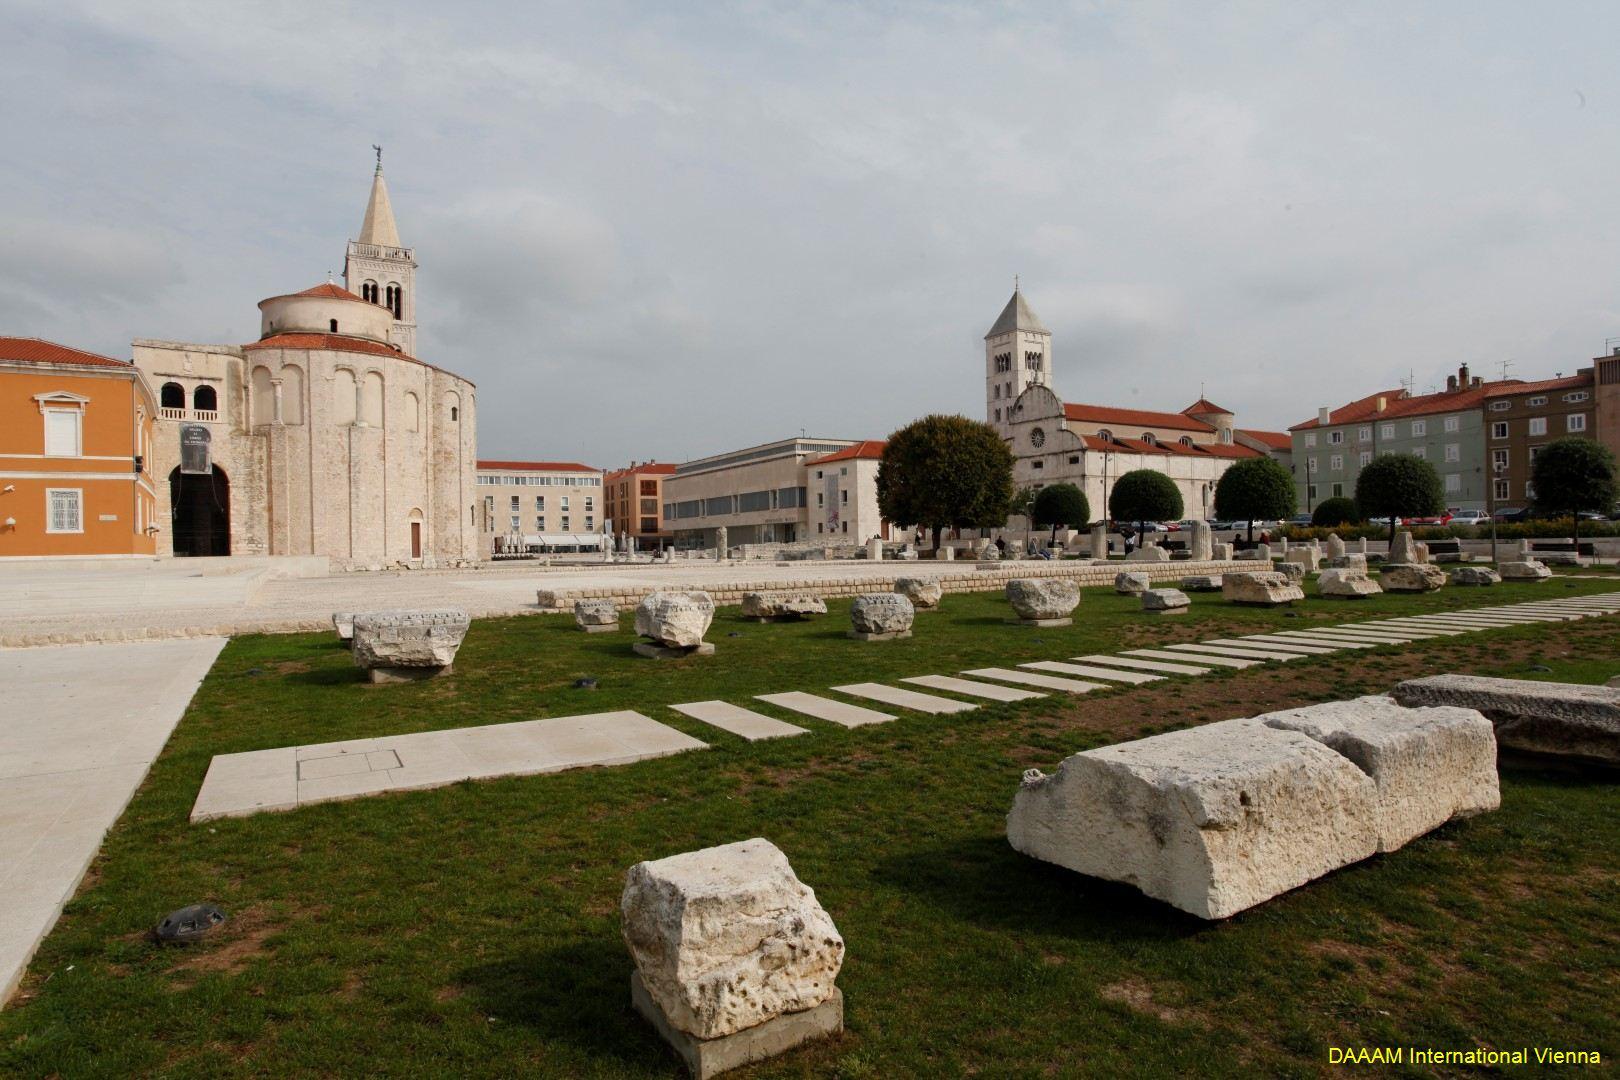 DAAAM_2012_Zadar_00_Zadar_City_037